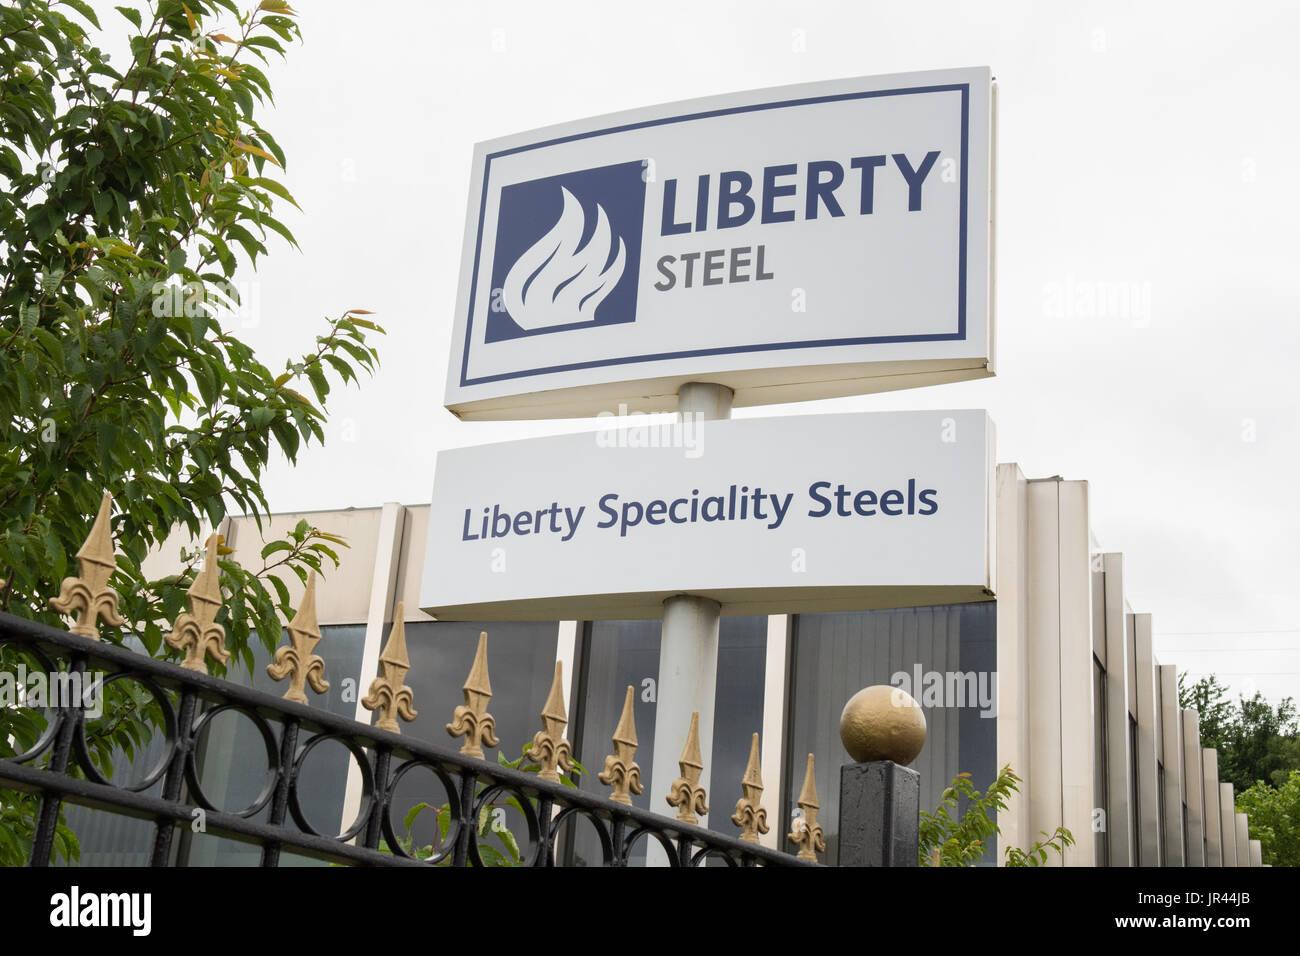 Liberty Steel - Liberty Speciality Steels sign, Stocksbridge, Sheffield, UK - Stock Image